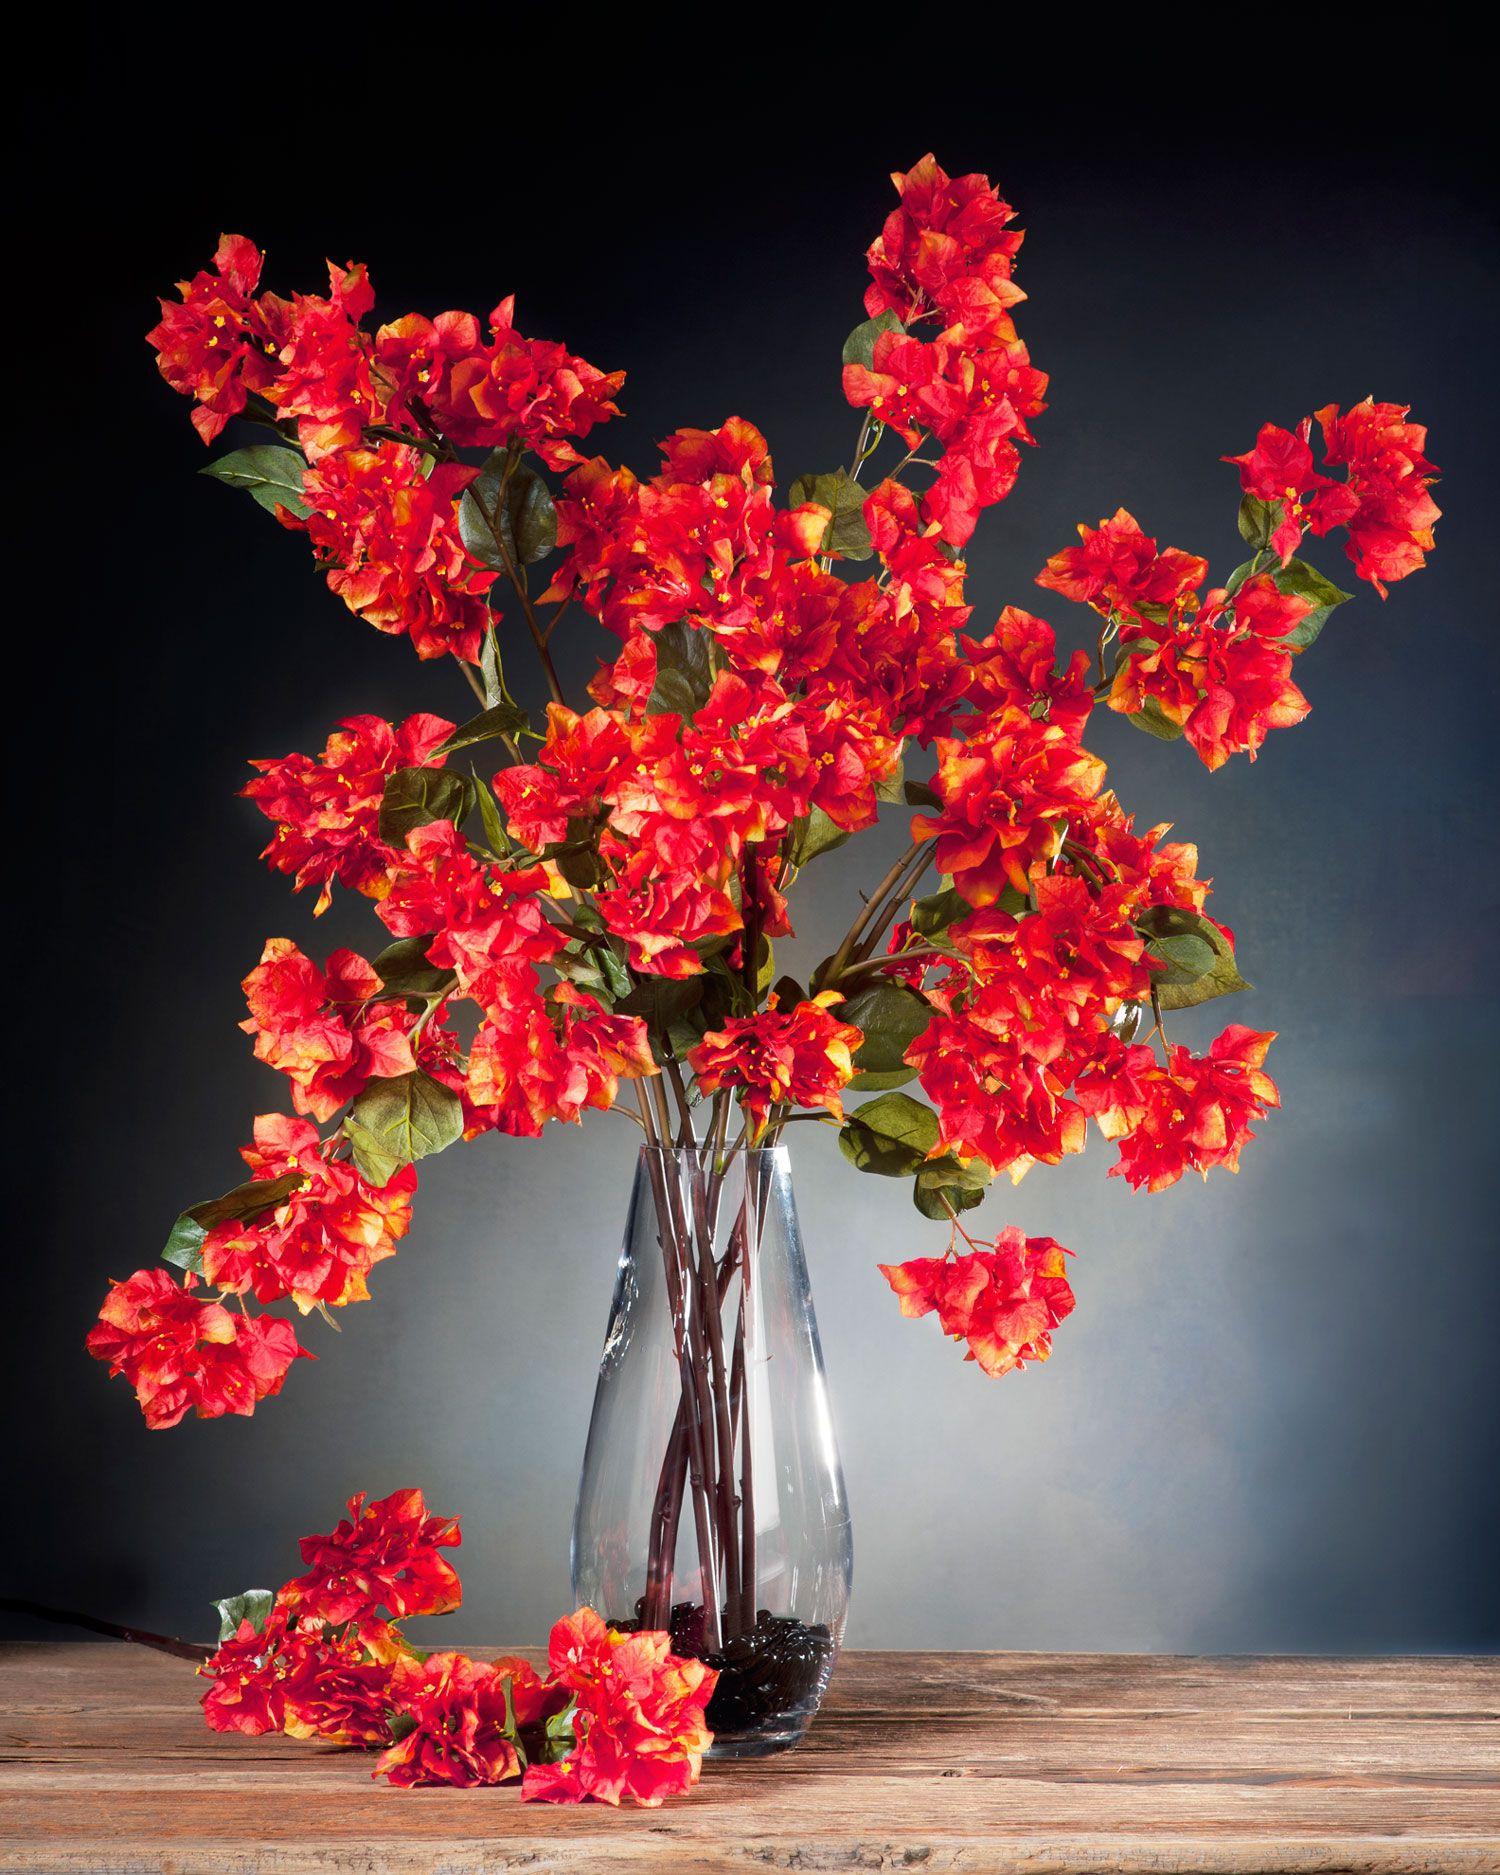 Bougainvillea Silk Flower Stems At Silkflowers Flowers For The